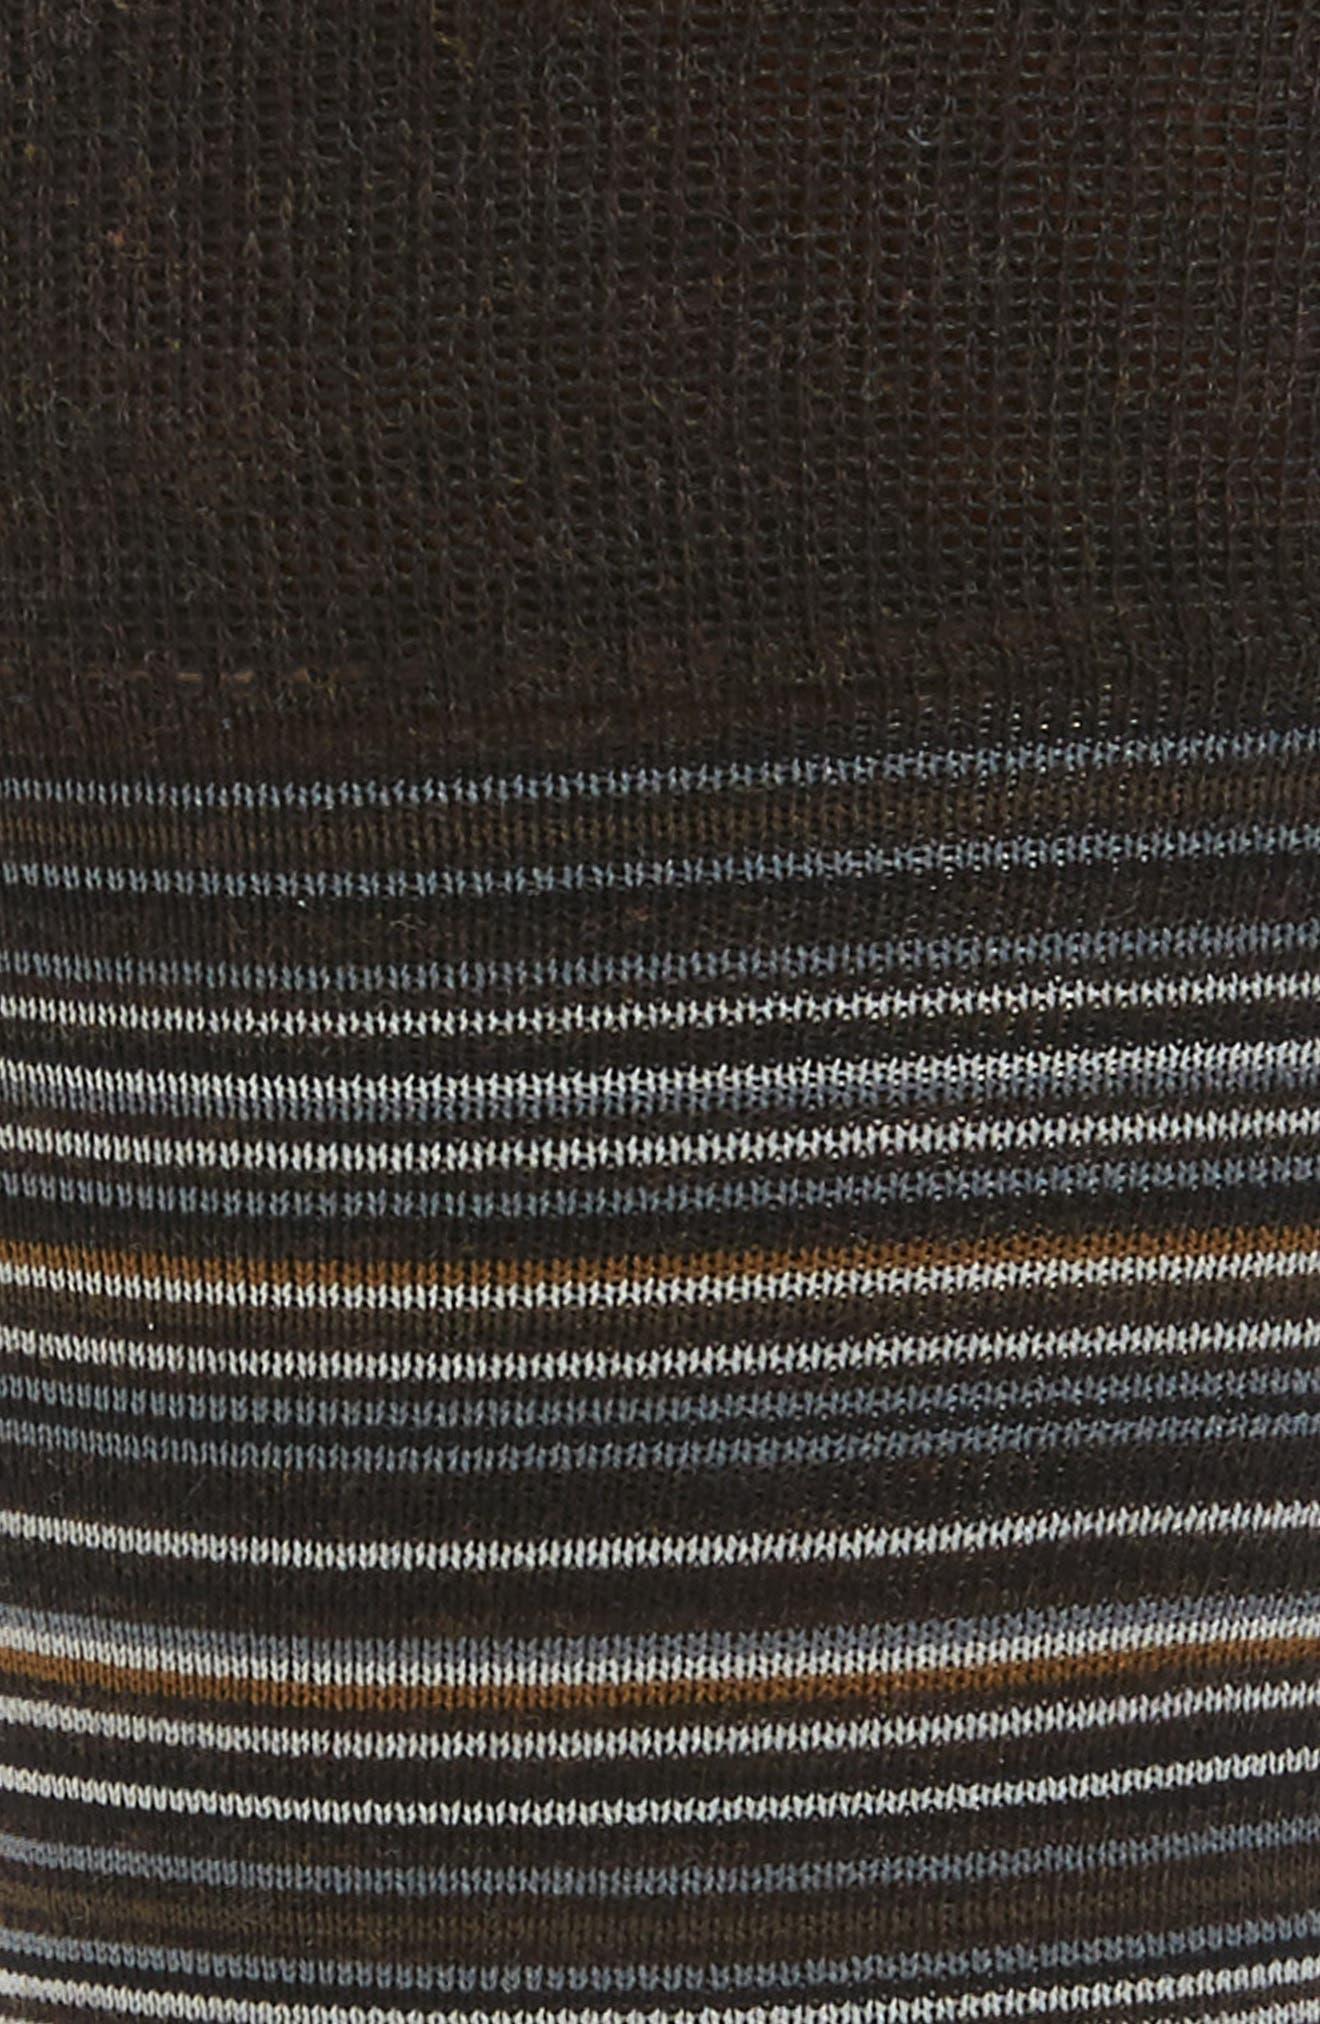 Multistripe Crew Socks,                             Alternate thumbnail 19, color,